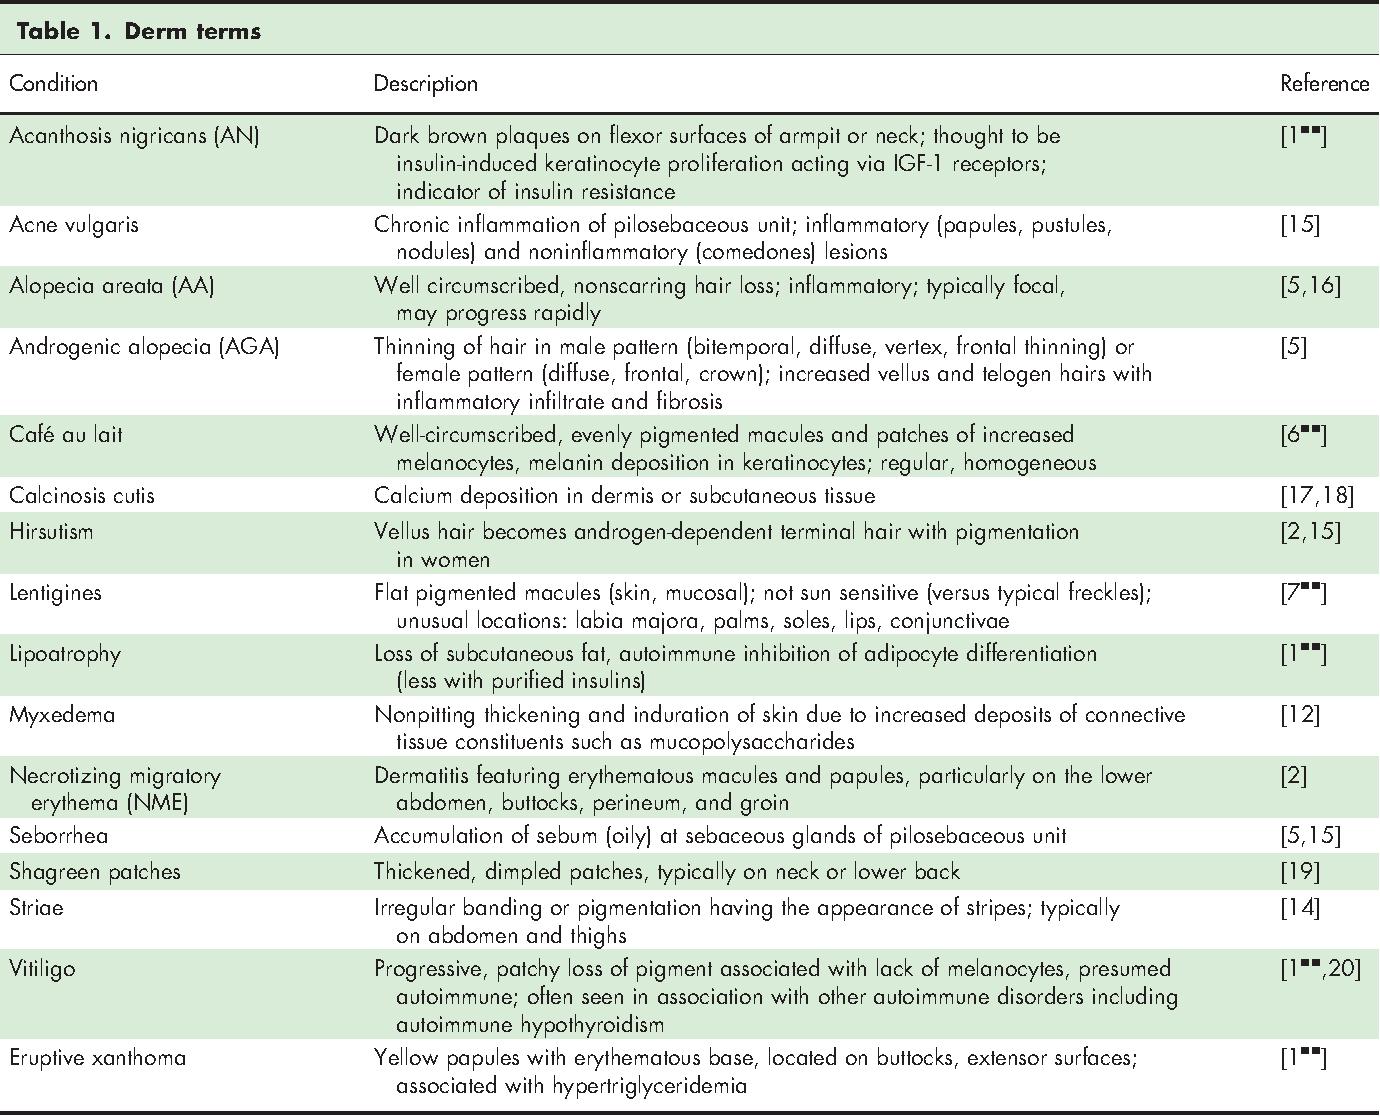 Table 1 From Dermatologic Manifestations Of Endocrine